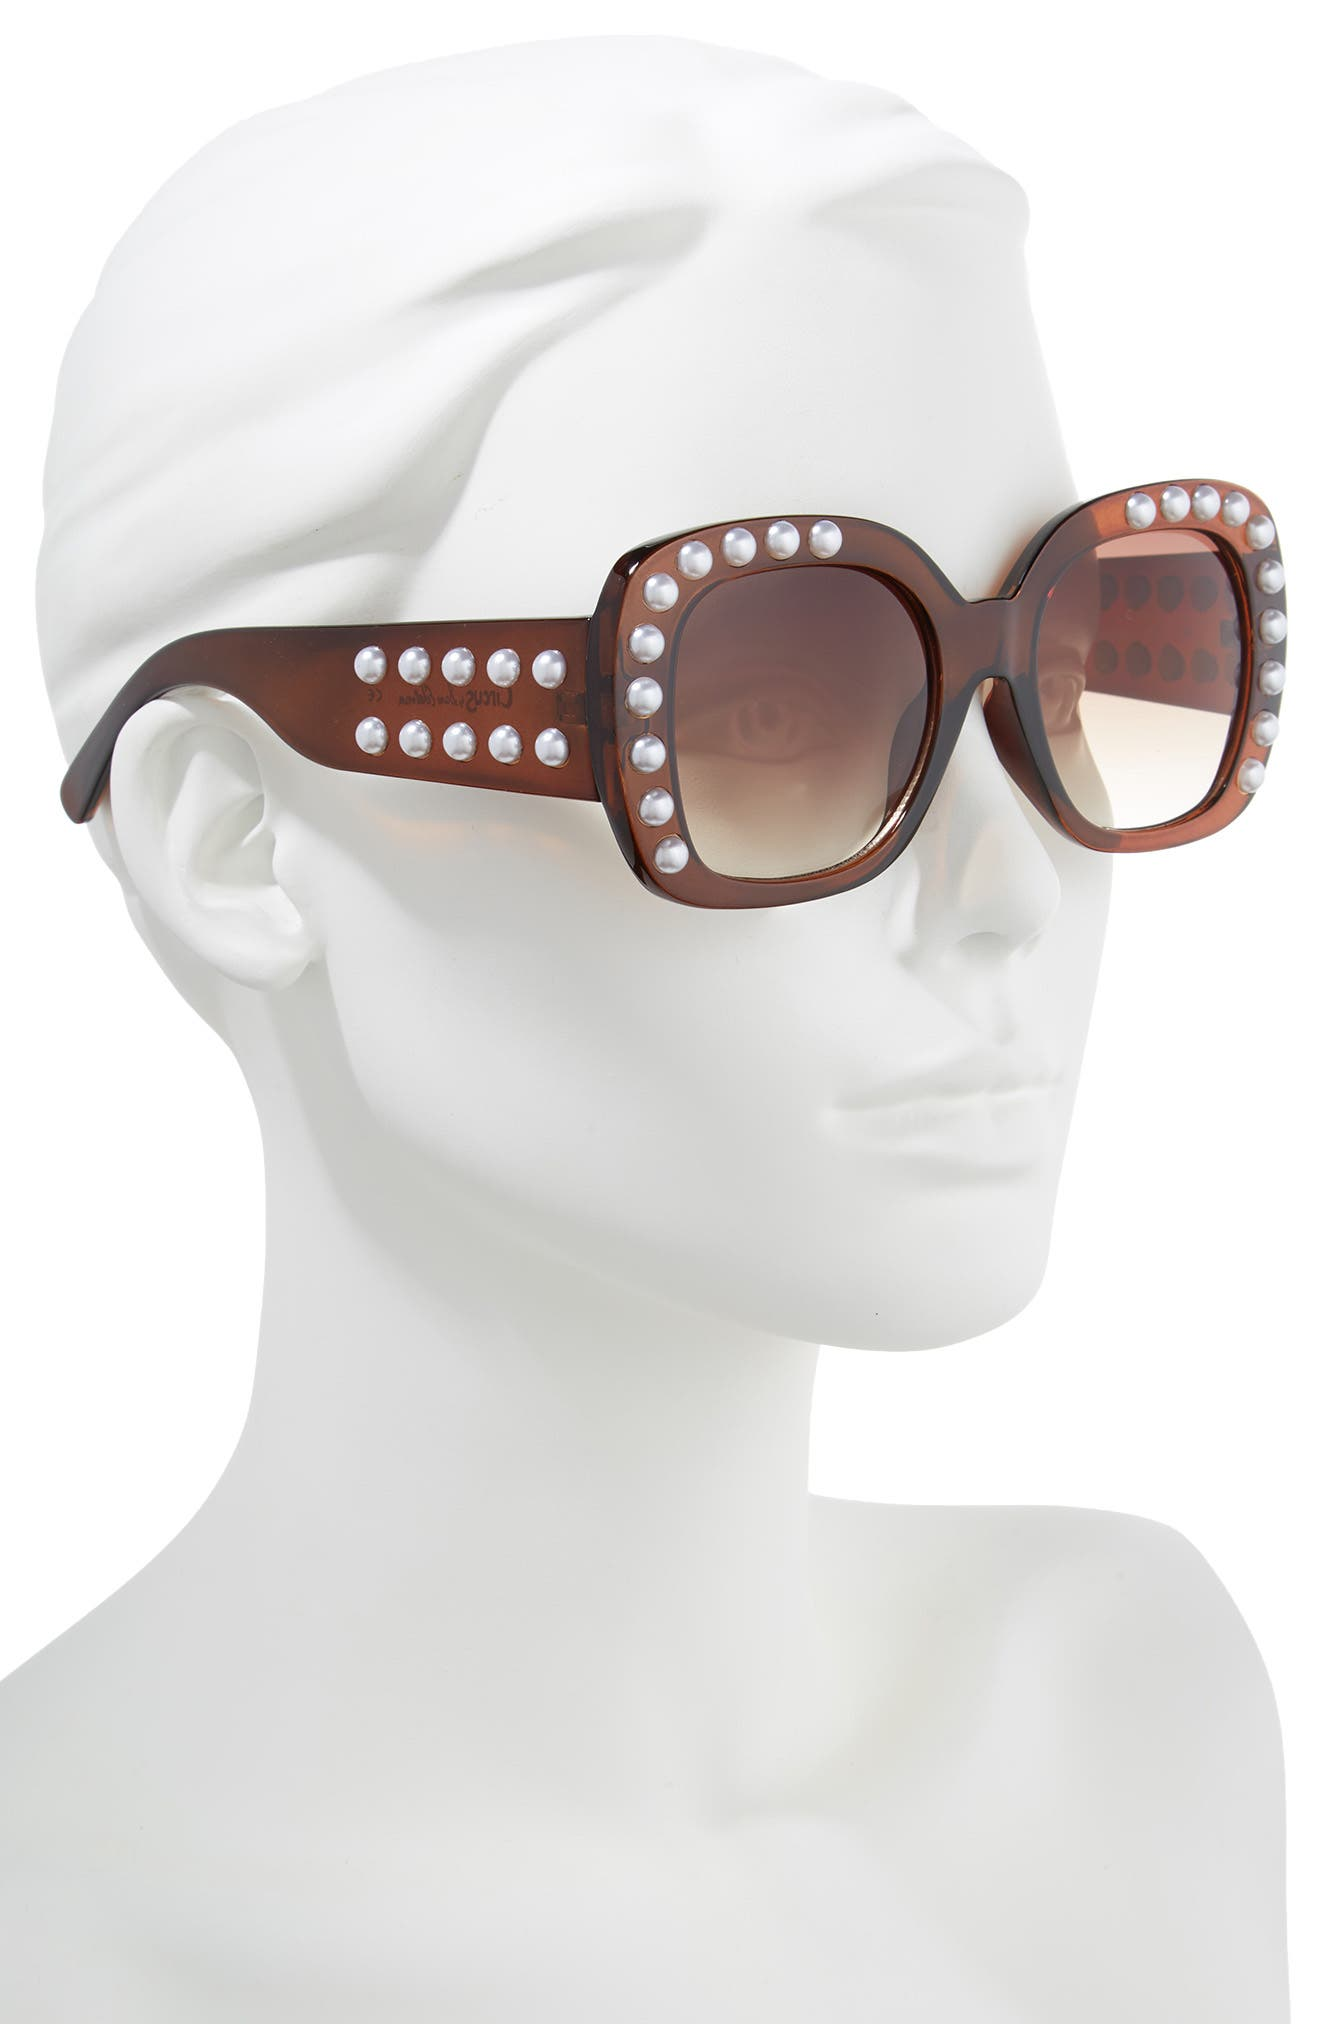 53mm Imitation Pearl Sunglasses,                             Alternate thumbnail 2, color,                             Brown